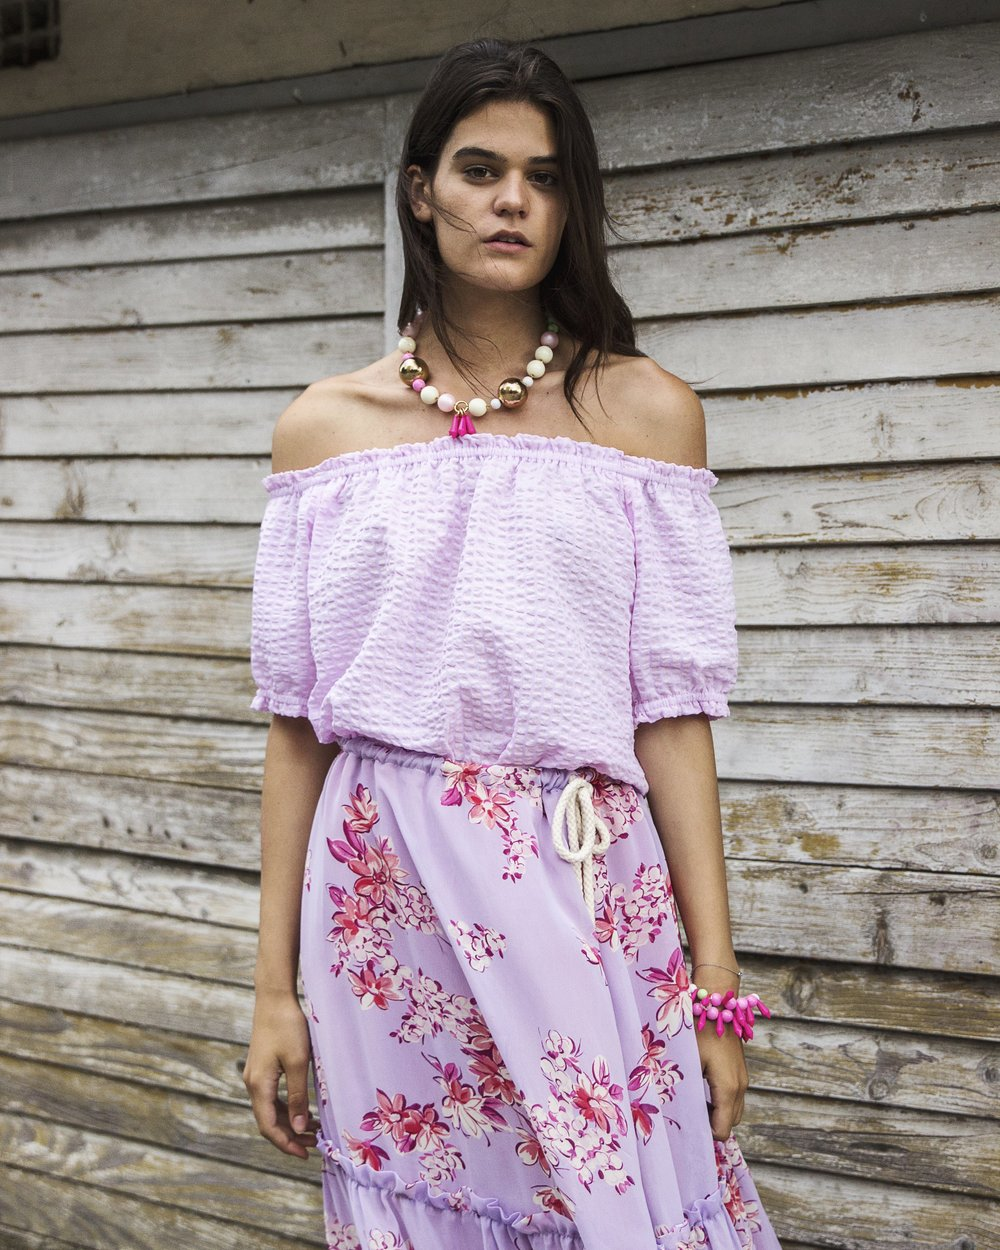 luka-lajic-fashion-photography-robert-sever-dizajner (9).jpg